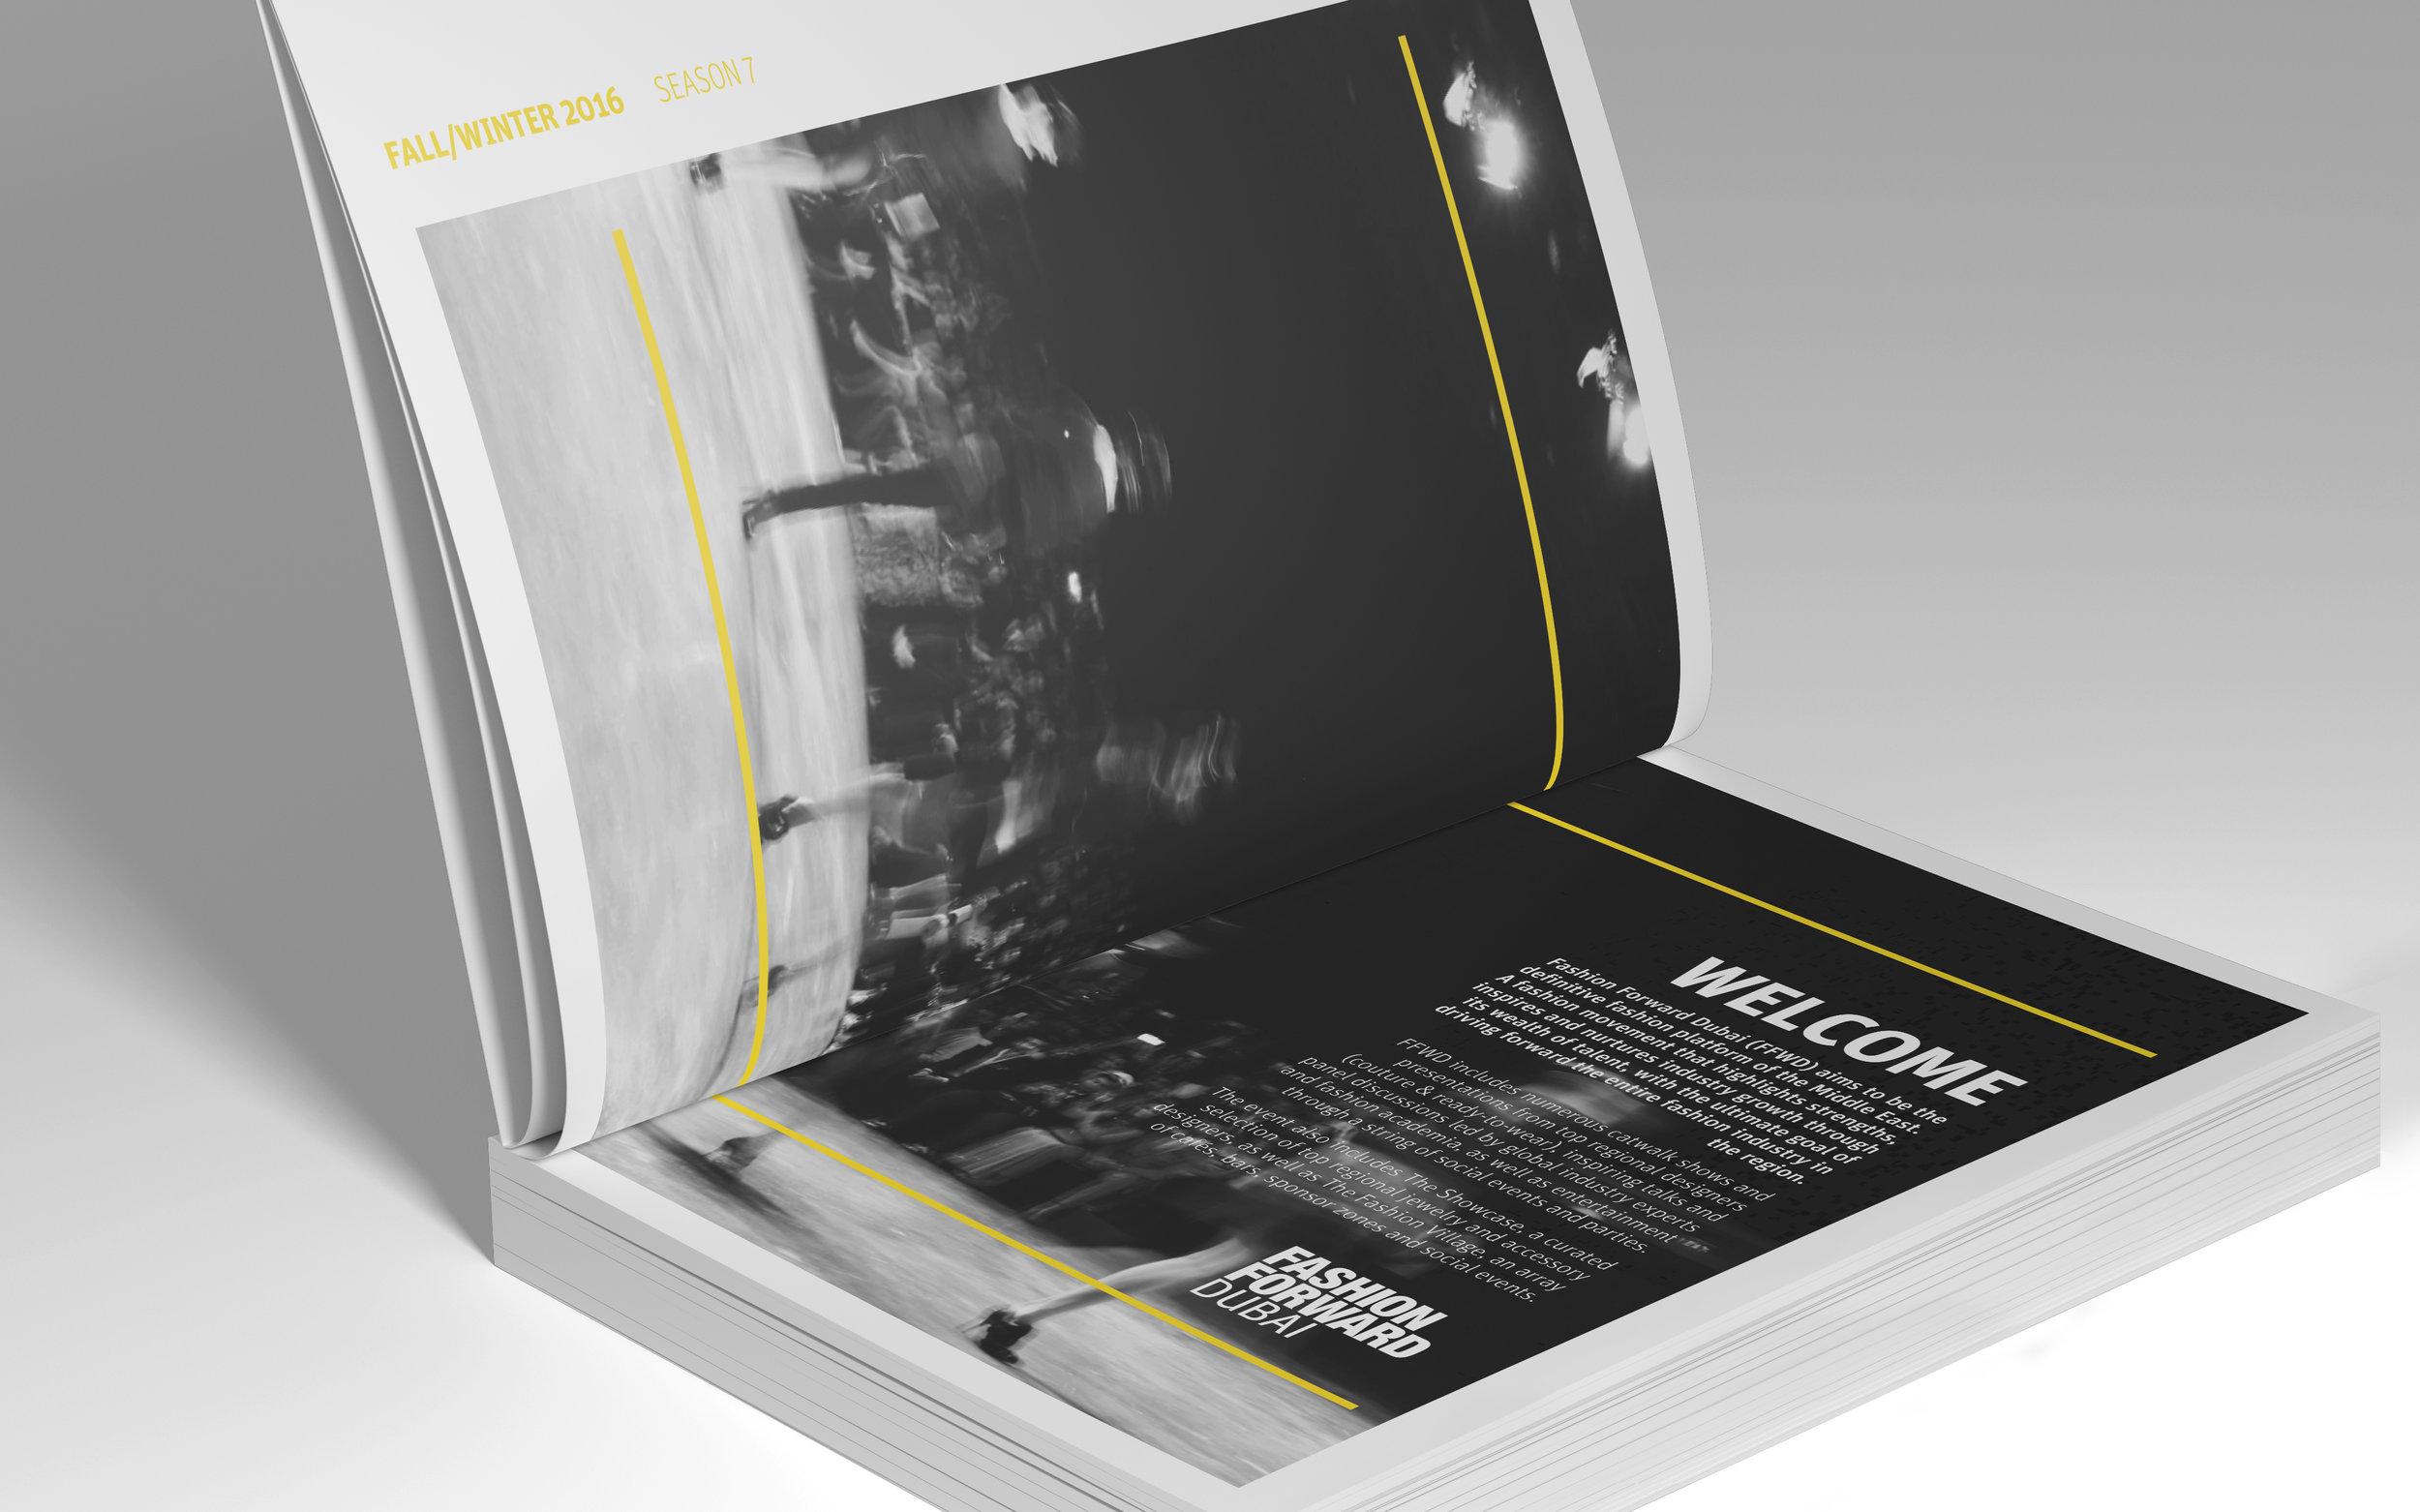 FFWDS9_Booklets_Inside.jpg